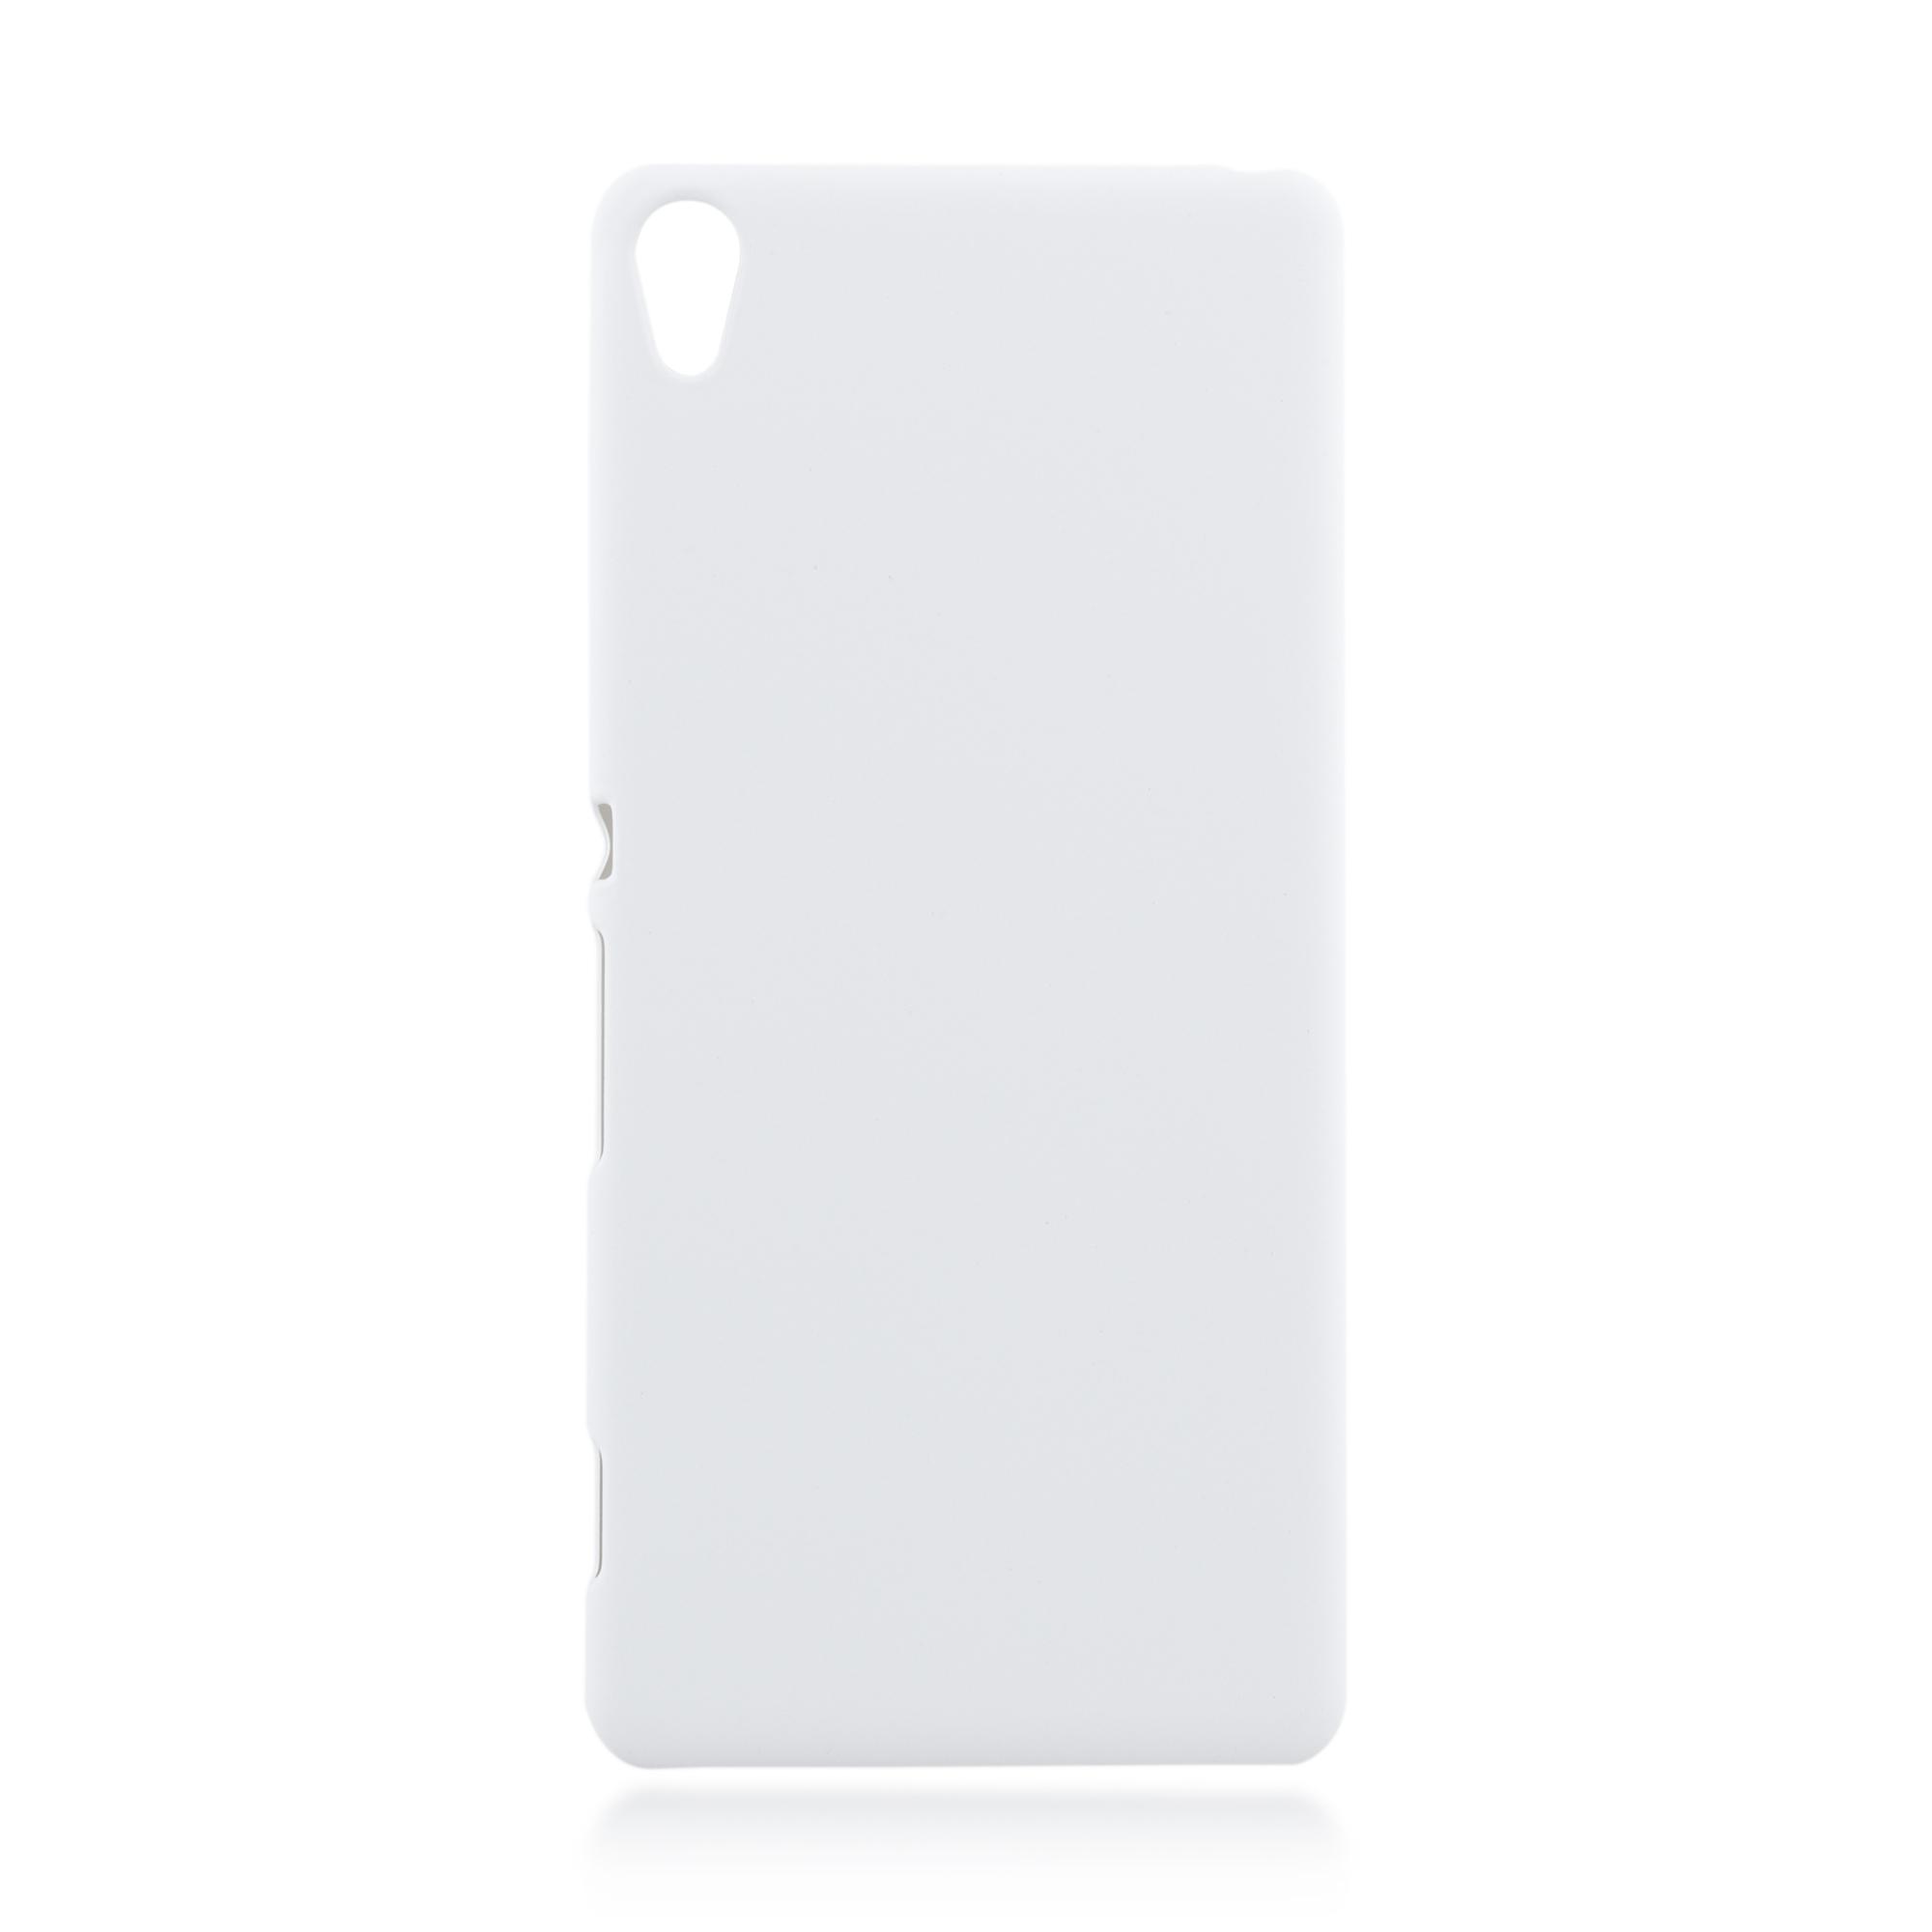 Пластиковая накладка Brosco Soft-touch для Sony Xperia XA, белая